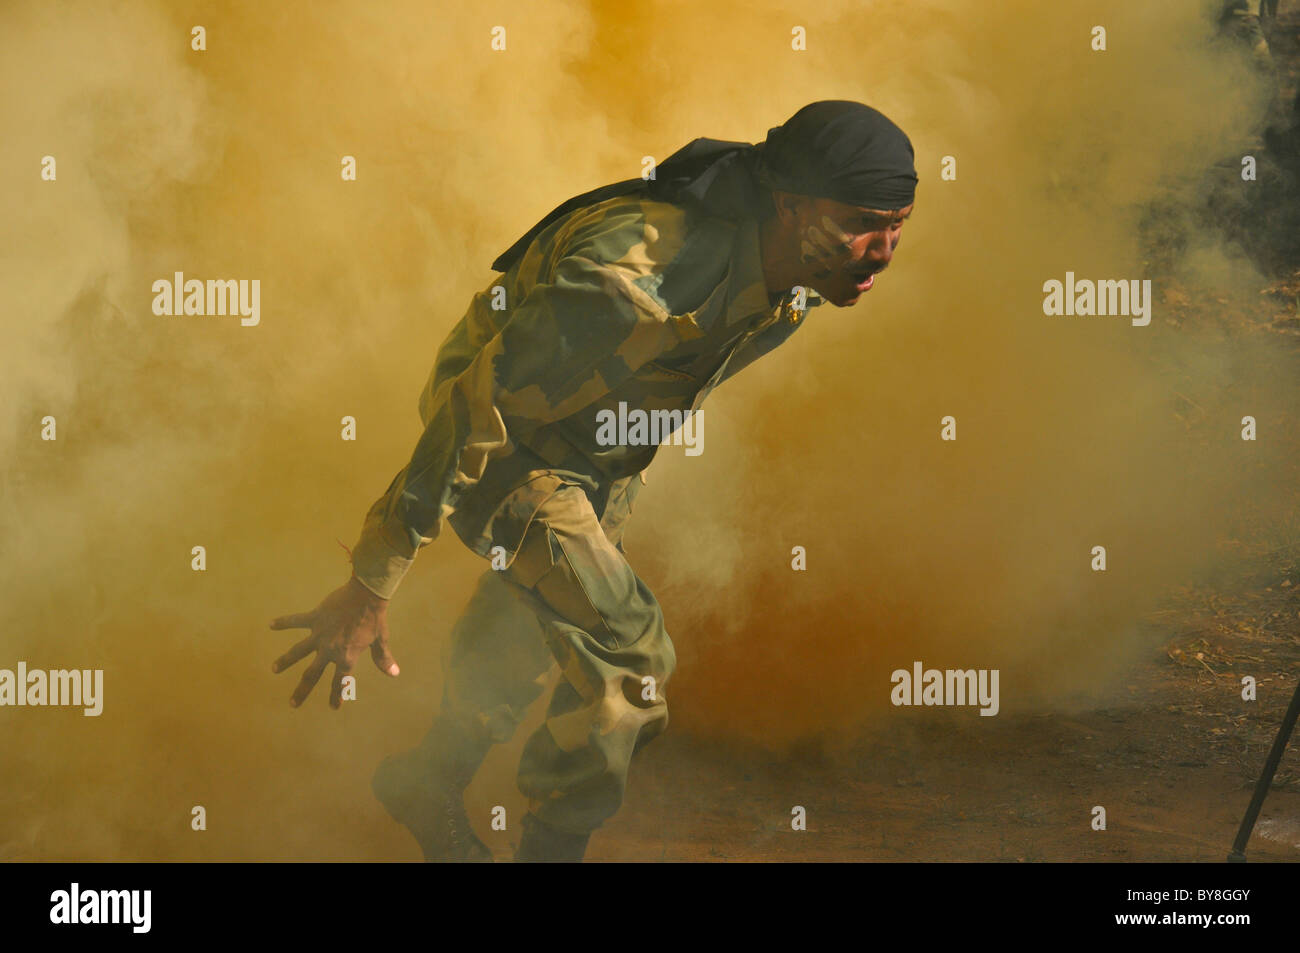 Un commando indien sortant d'un écran de fumée obstacle Photo Stock